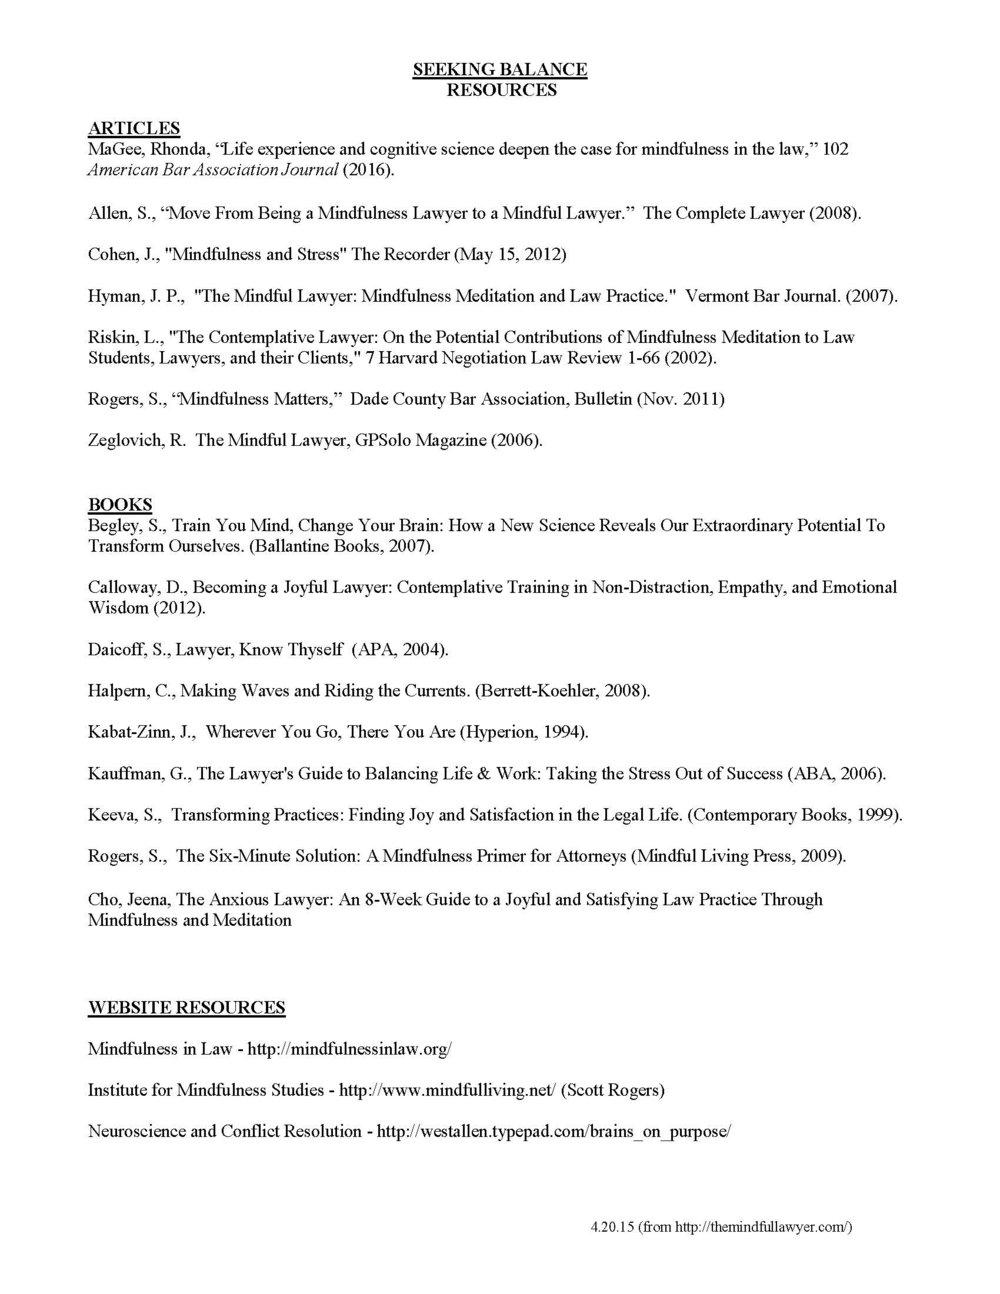 SEEKINGBALANCERESOURCES9.20.17_Page_1.jpg